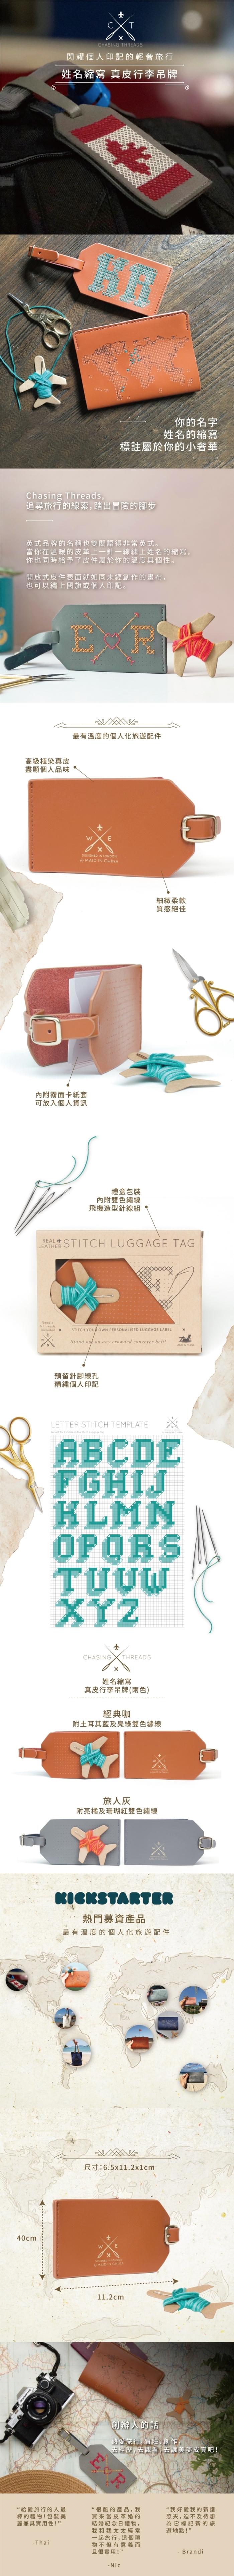 Chasing Threads|姓名縮寫 真皮行李吊牌 (旅人灰)